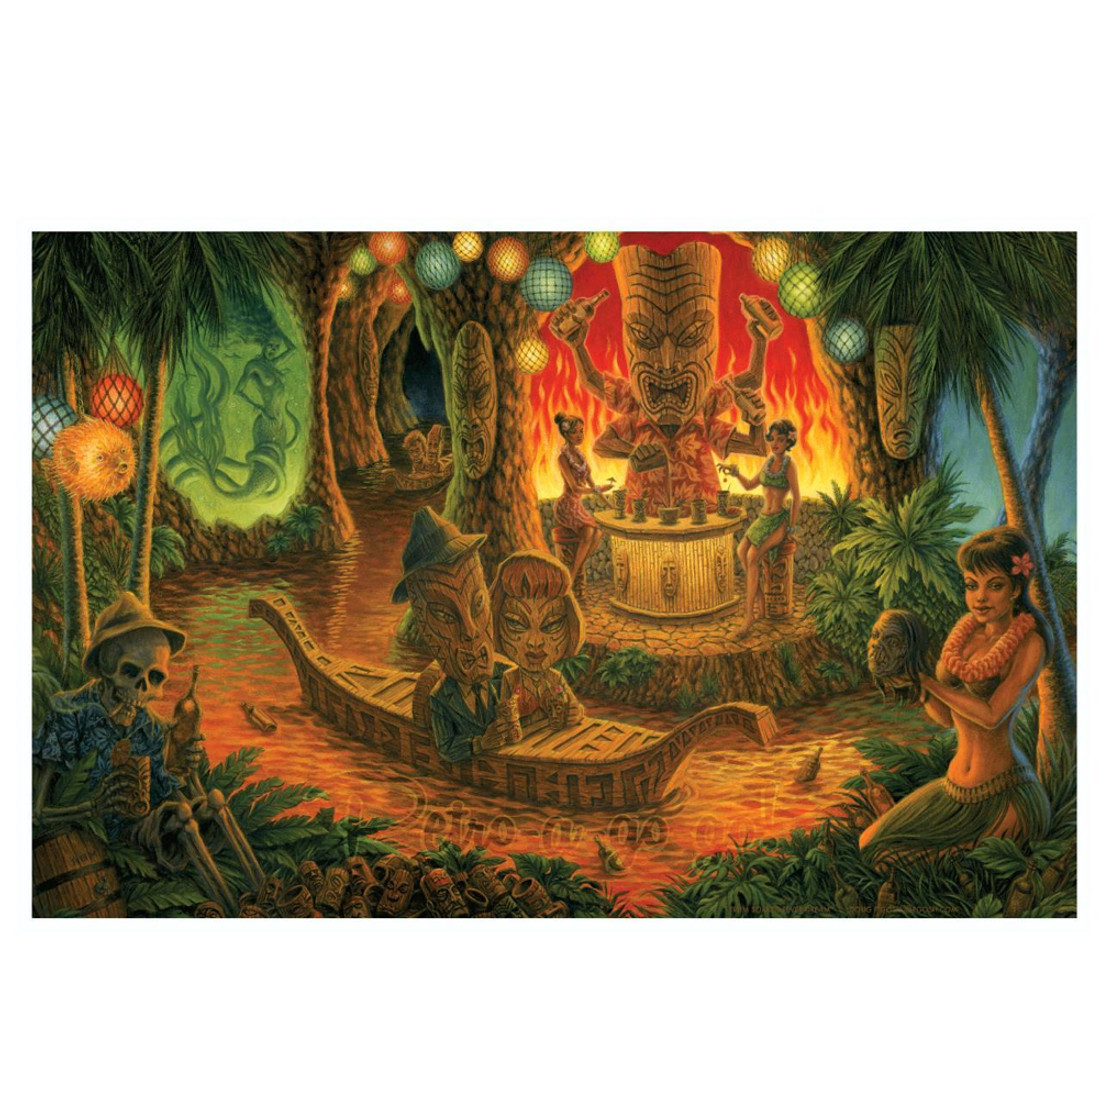 Doug P'gosh Rum Soaked Fever Dream Art Print